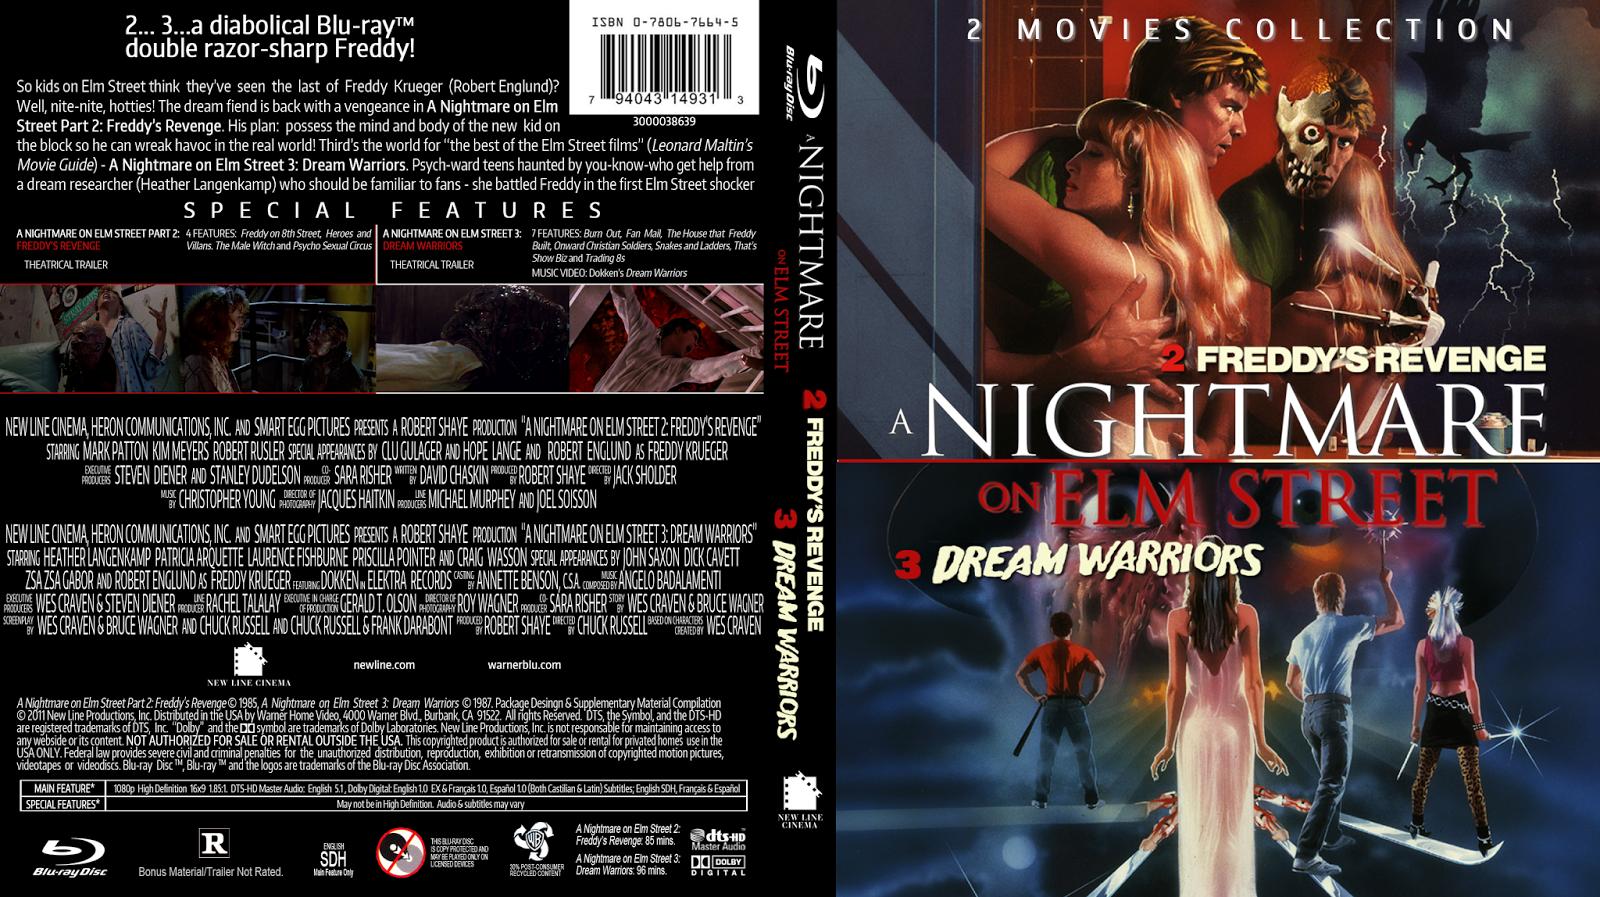 a nightmare on elm street blu ray cover